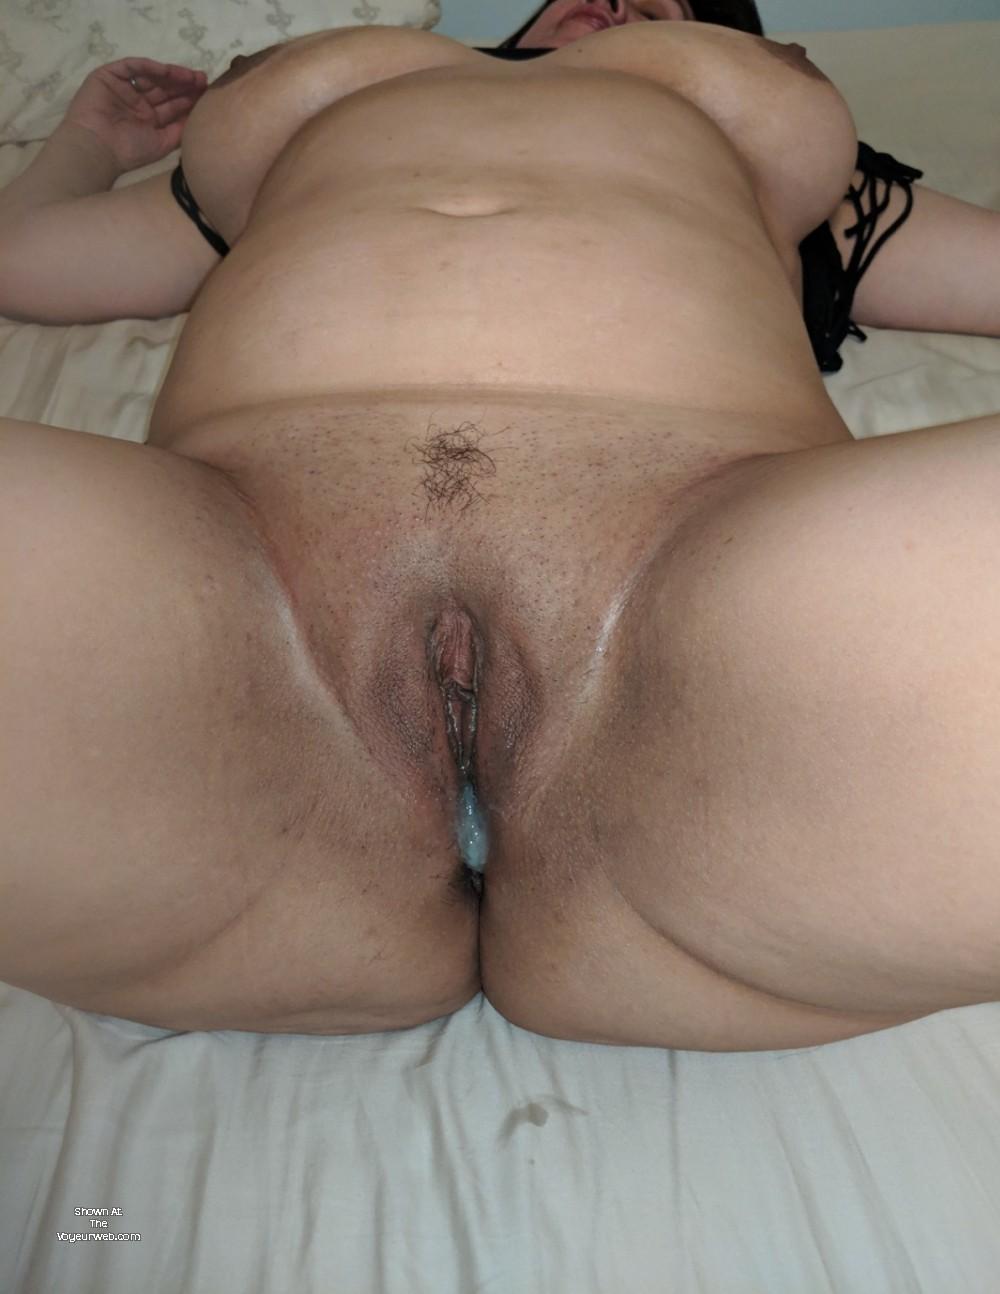 Pic #1My ass - Cherry